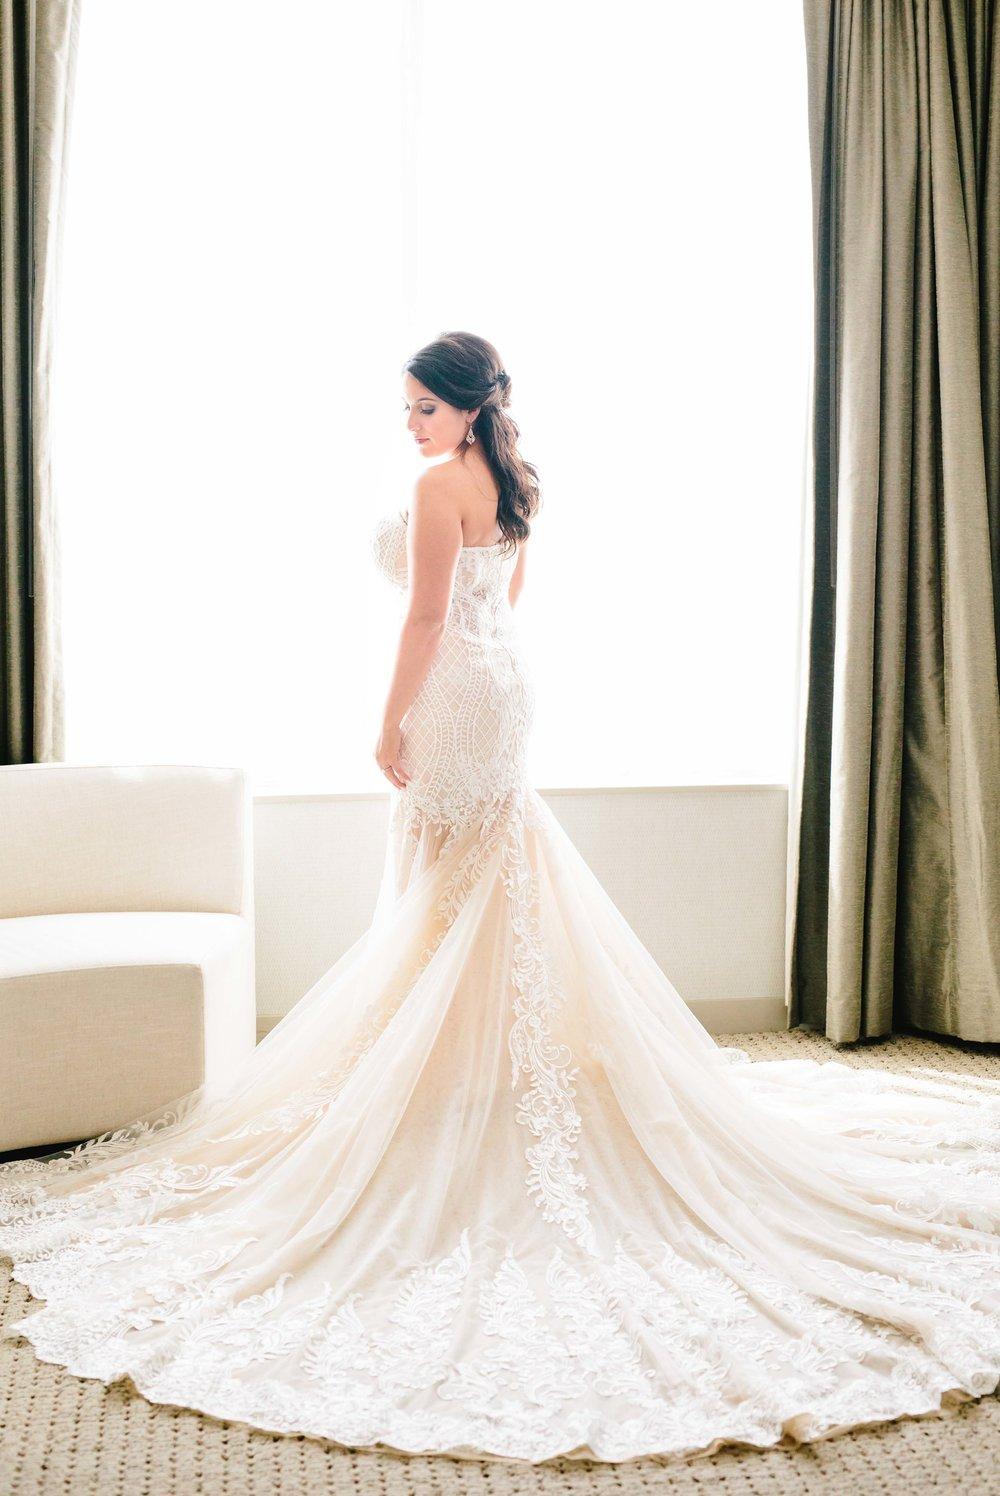 chicago-fine-art-wedding-photography-douglas14